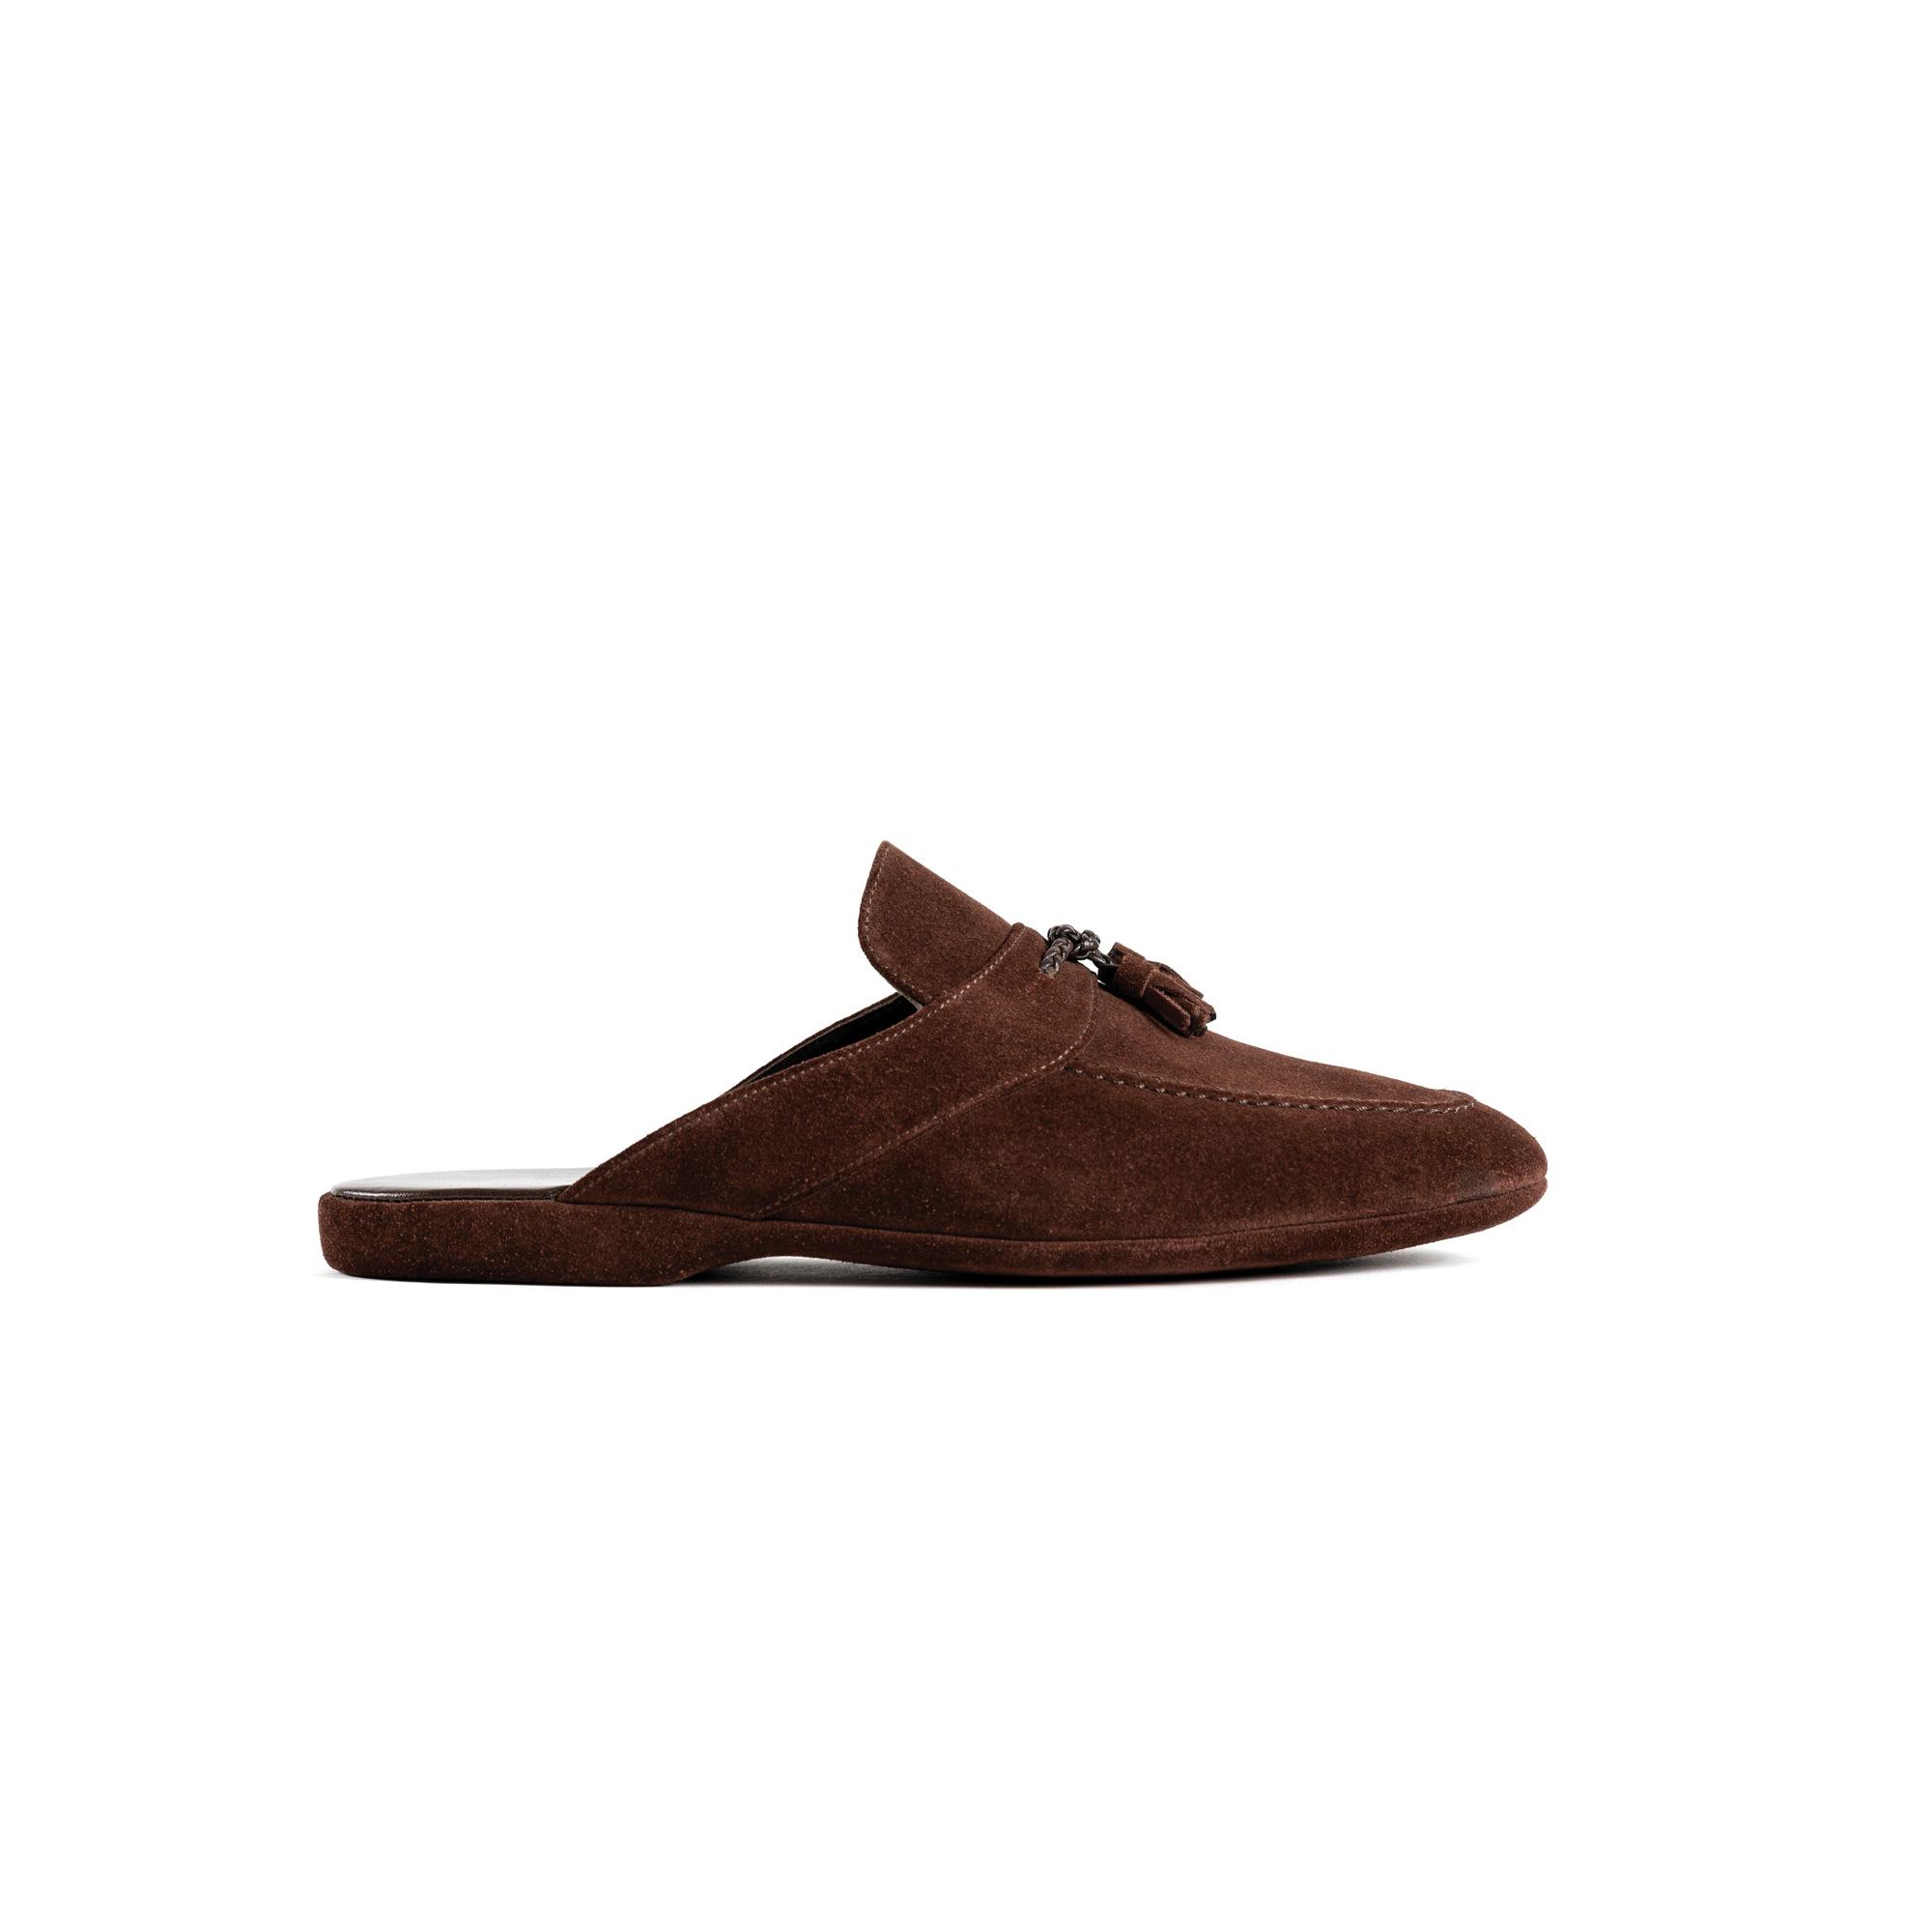 Indoor classic slipper open in brown velour - Farfalla italian slippers